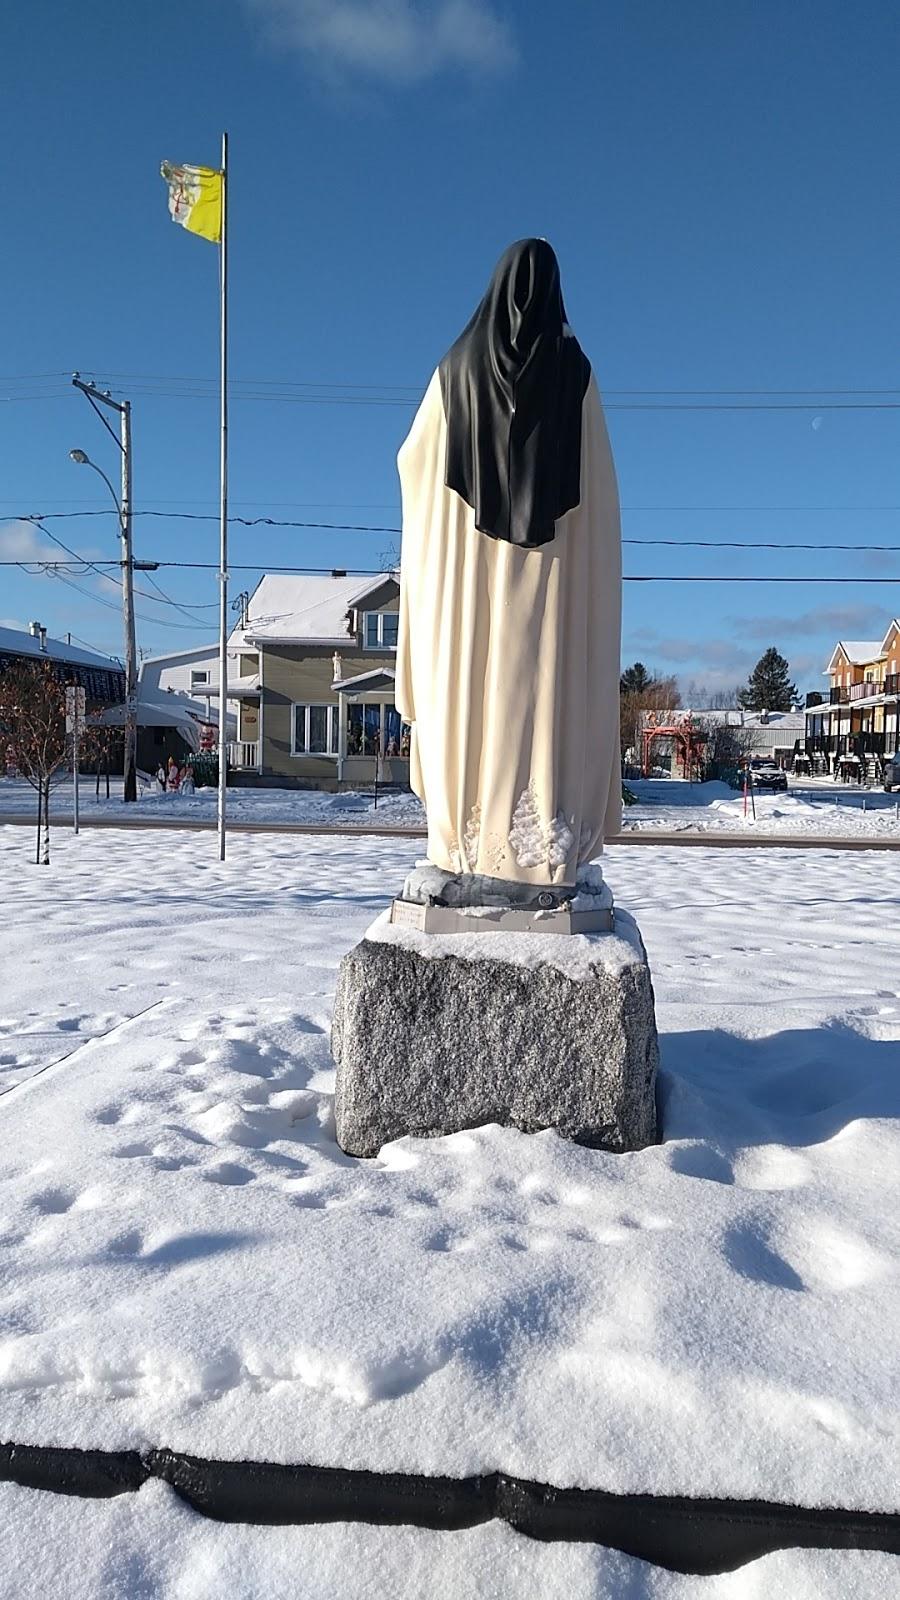 Presbytère Sainte-Thérèse-de-Lisieux | church | 158 Rue Bertrand, Québec, QC G1B 1H7, Canada | 4186634011 OR +1 418-663-4011